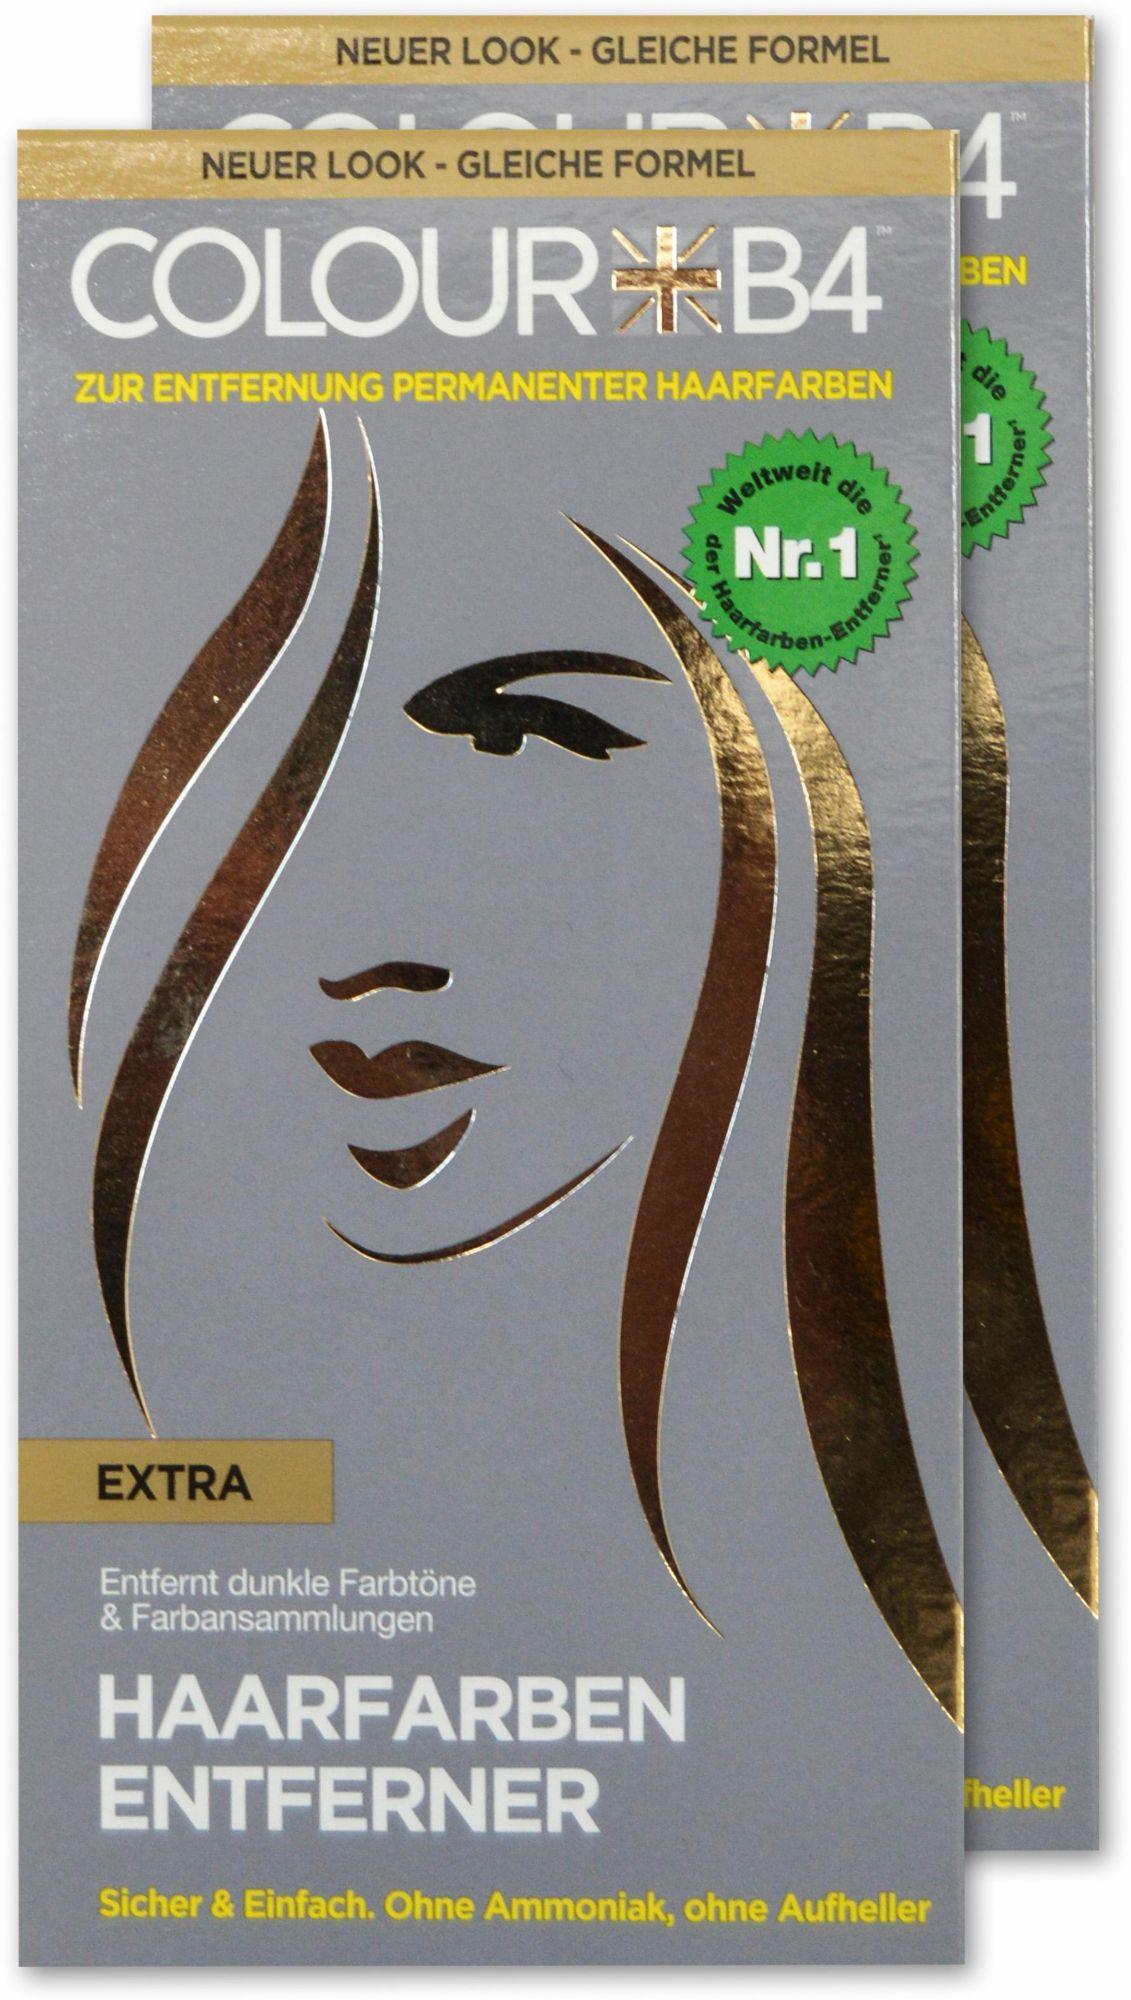 COLOUR B4 Colour B4, »Colour B4 Extra«, Haarfarben-Entferner zum Entfernen dunkler Farbtöne